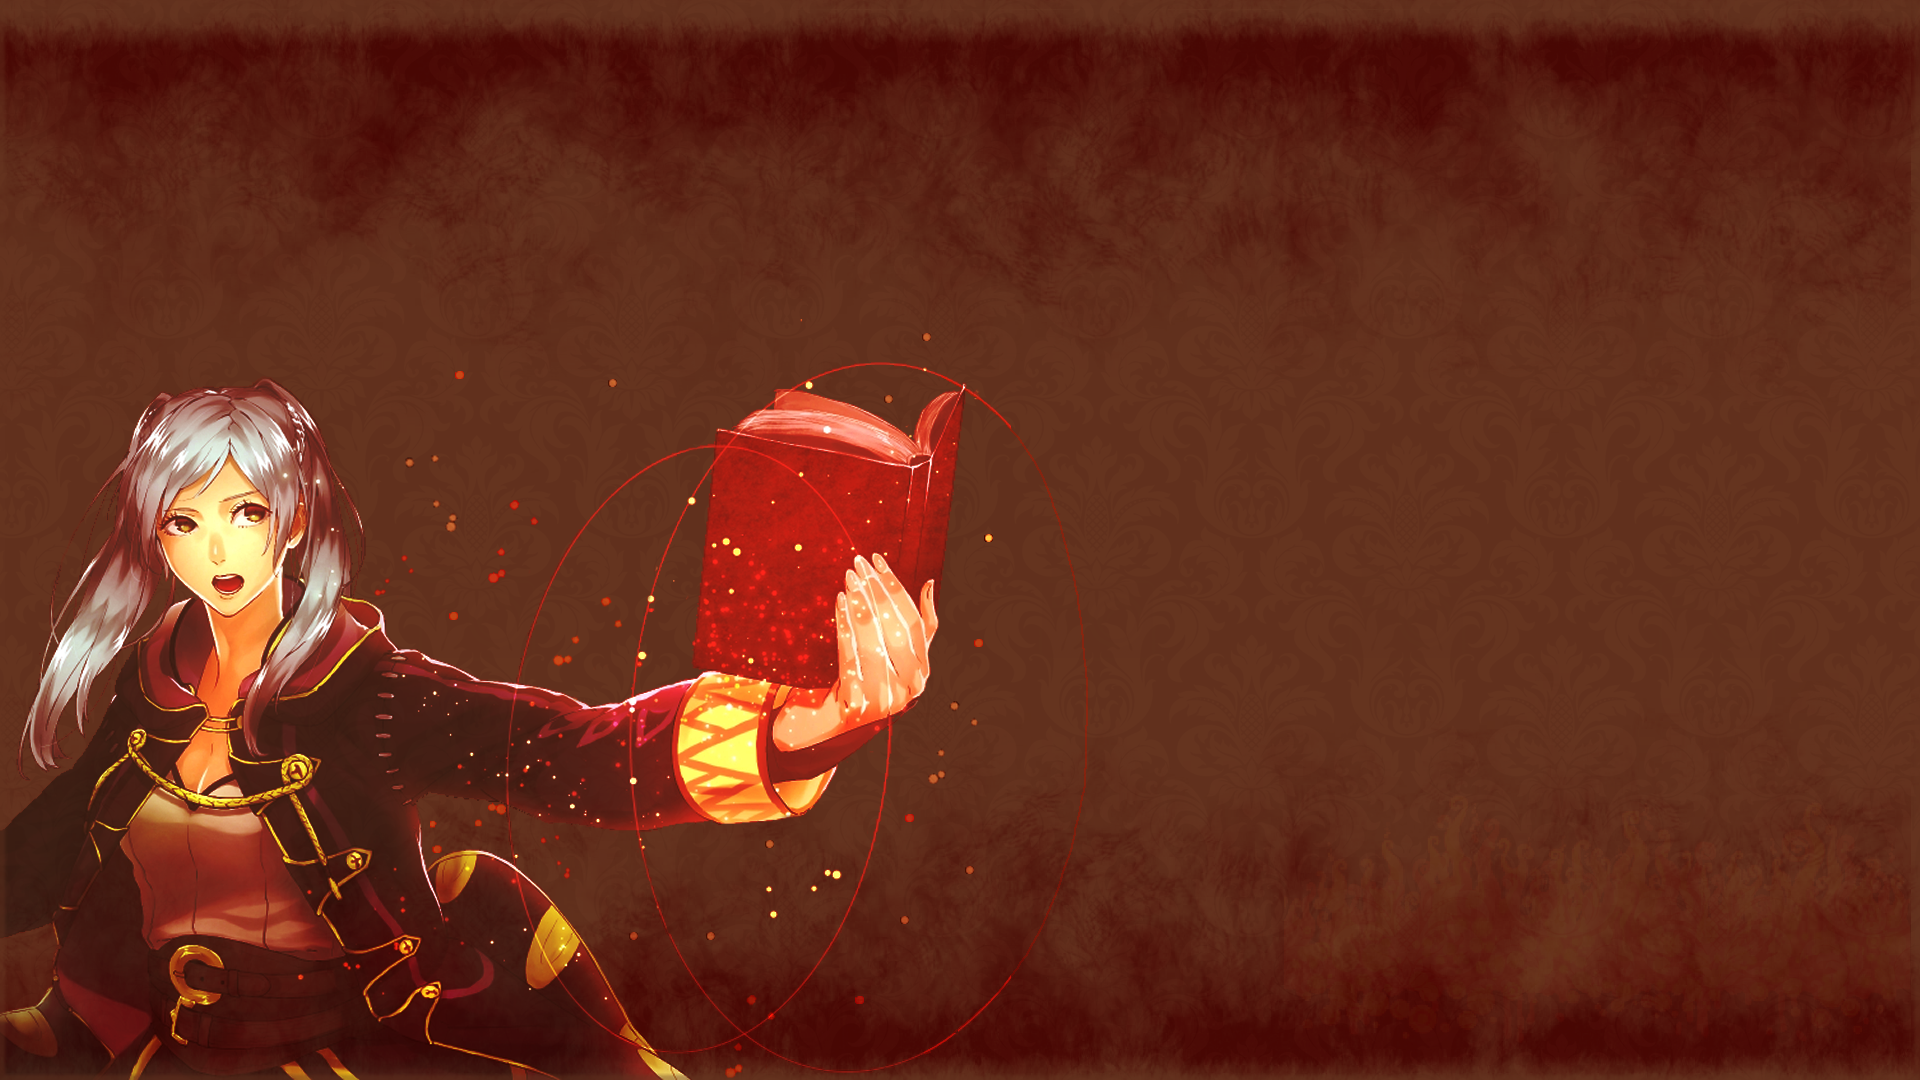 Robin Fire Emblem Game Games 1920x1080 hdweweb4com 1920x1080